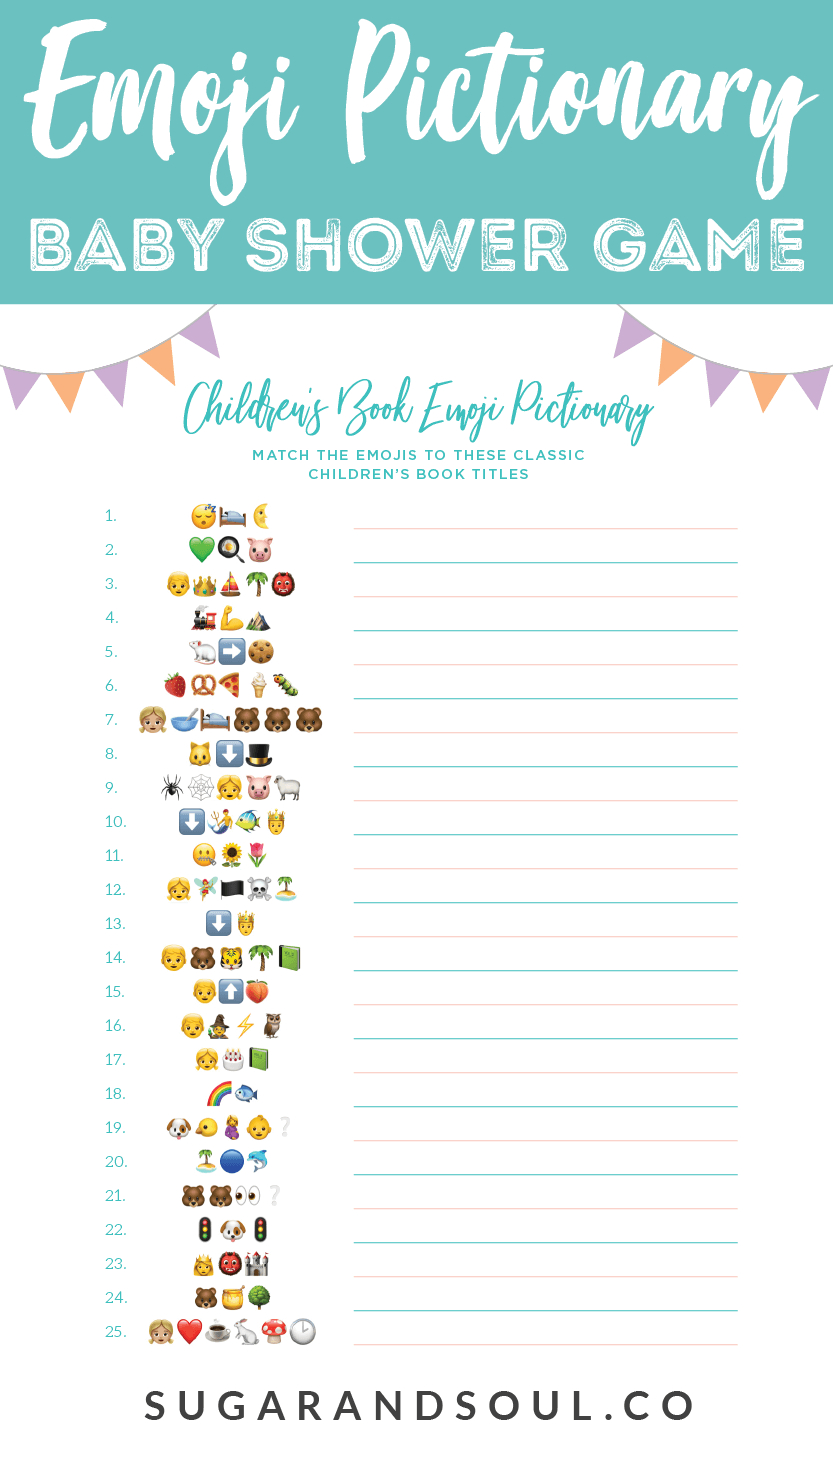 This Free Emoji Pictionary Baby Shower Game Printable Uses Emoji - Baby Invitations Printable Free